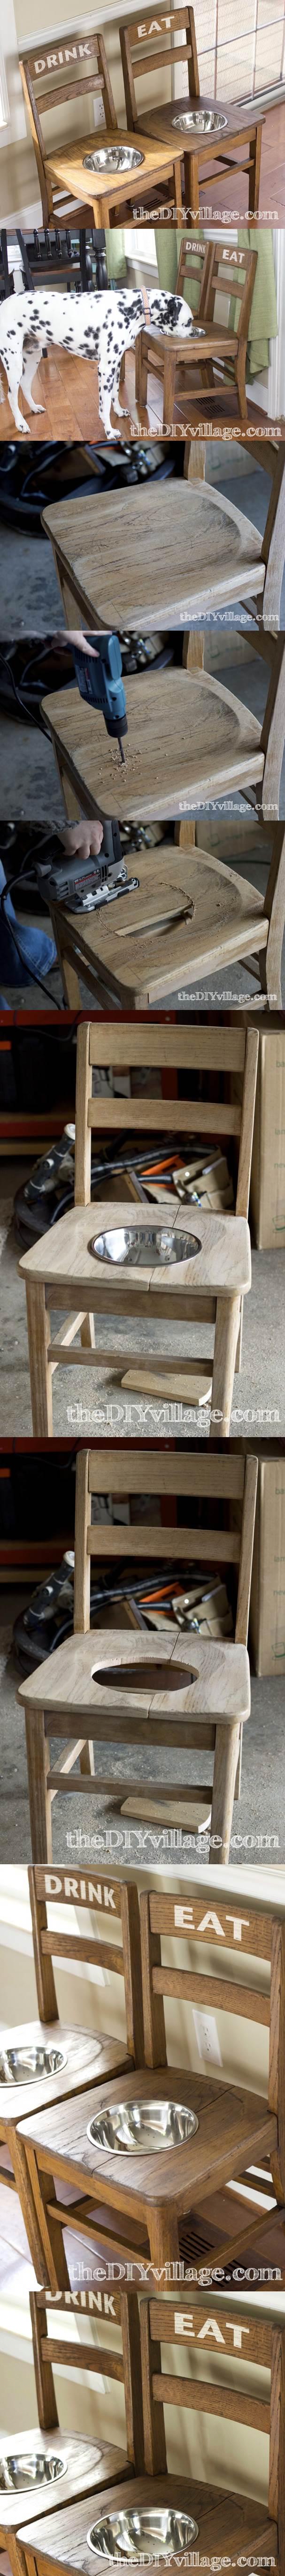 DIY Dog Bowl Chairs 2